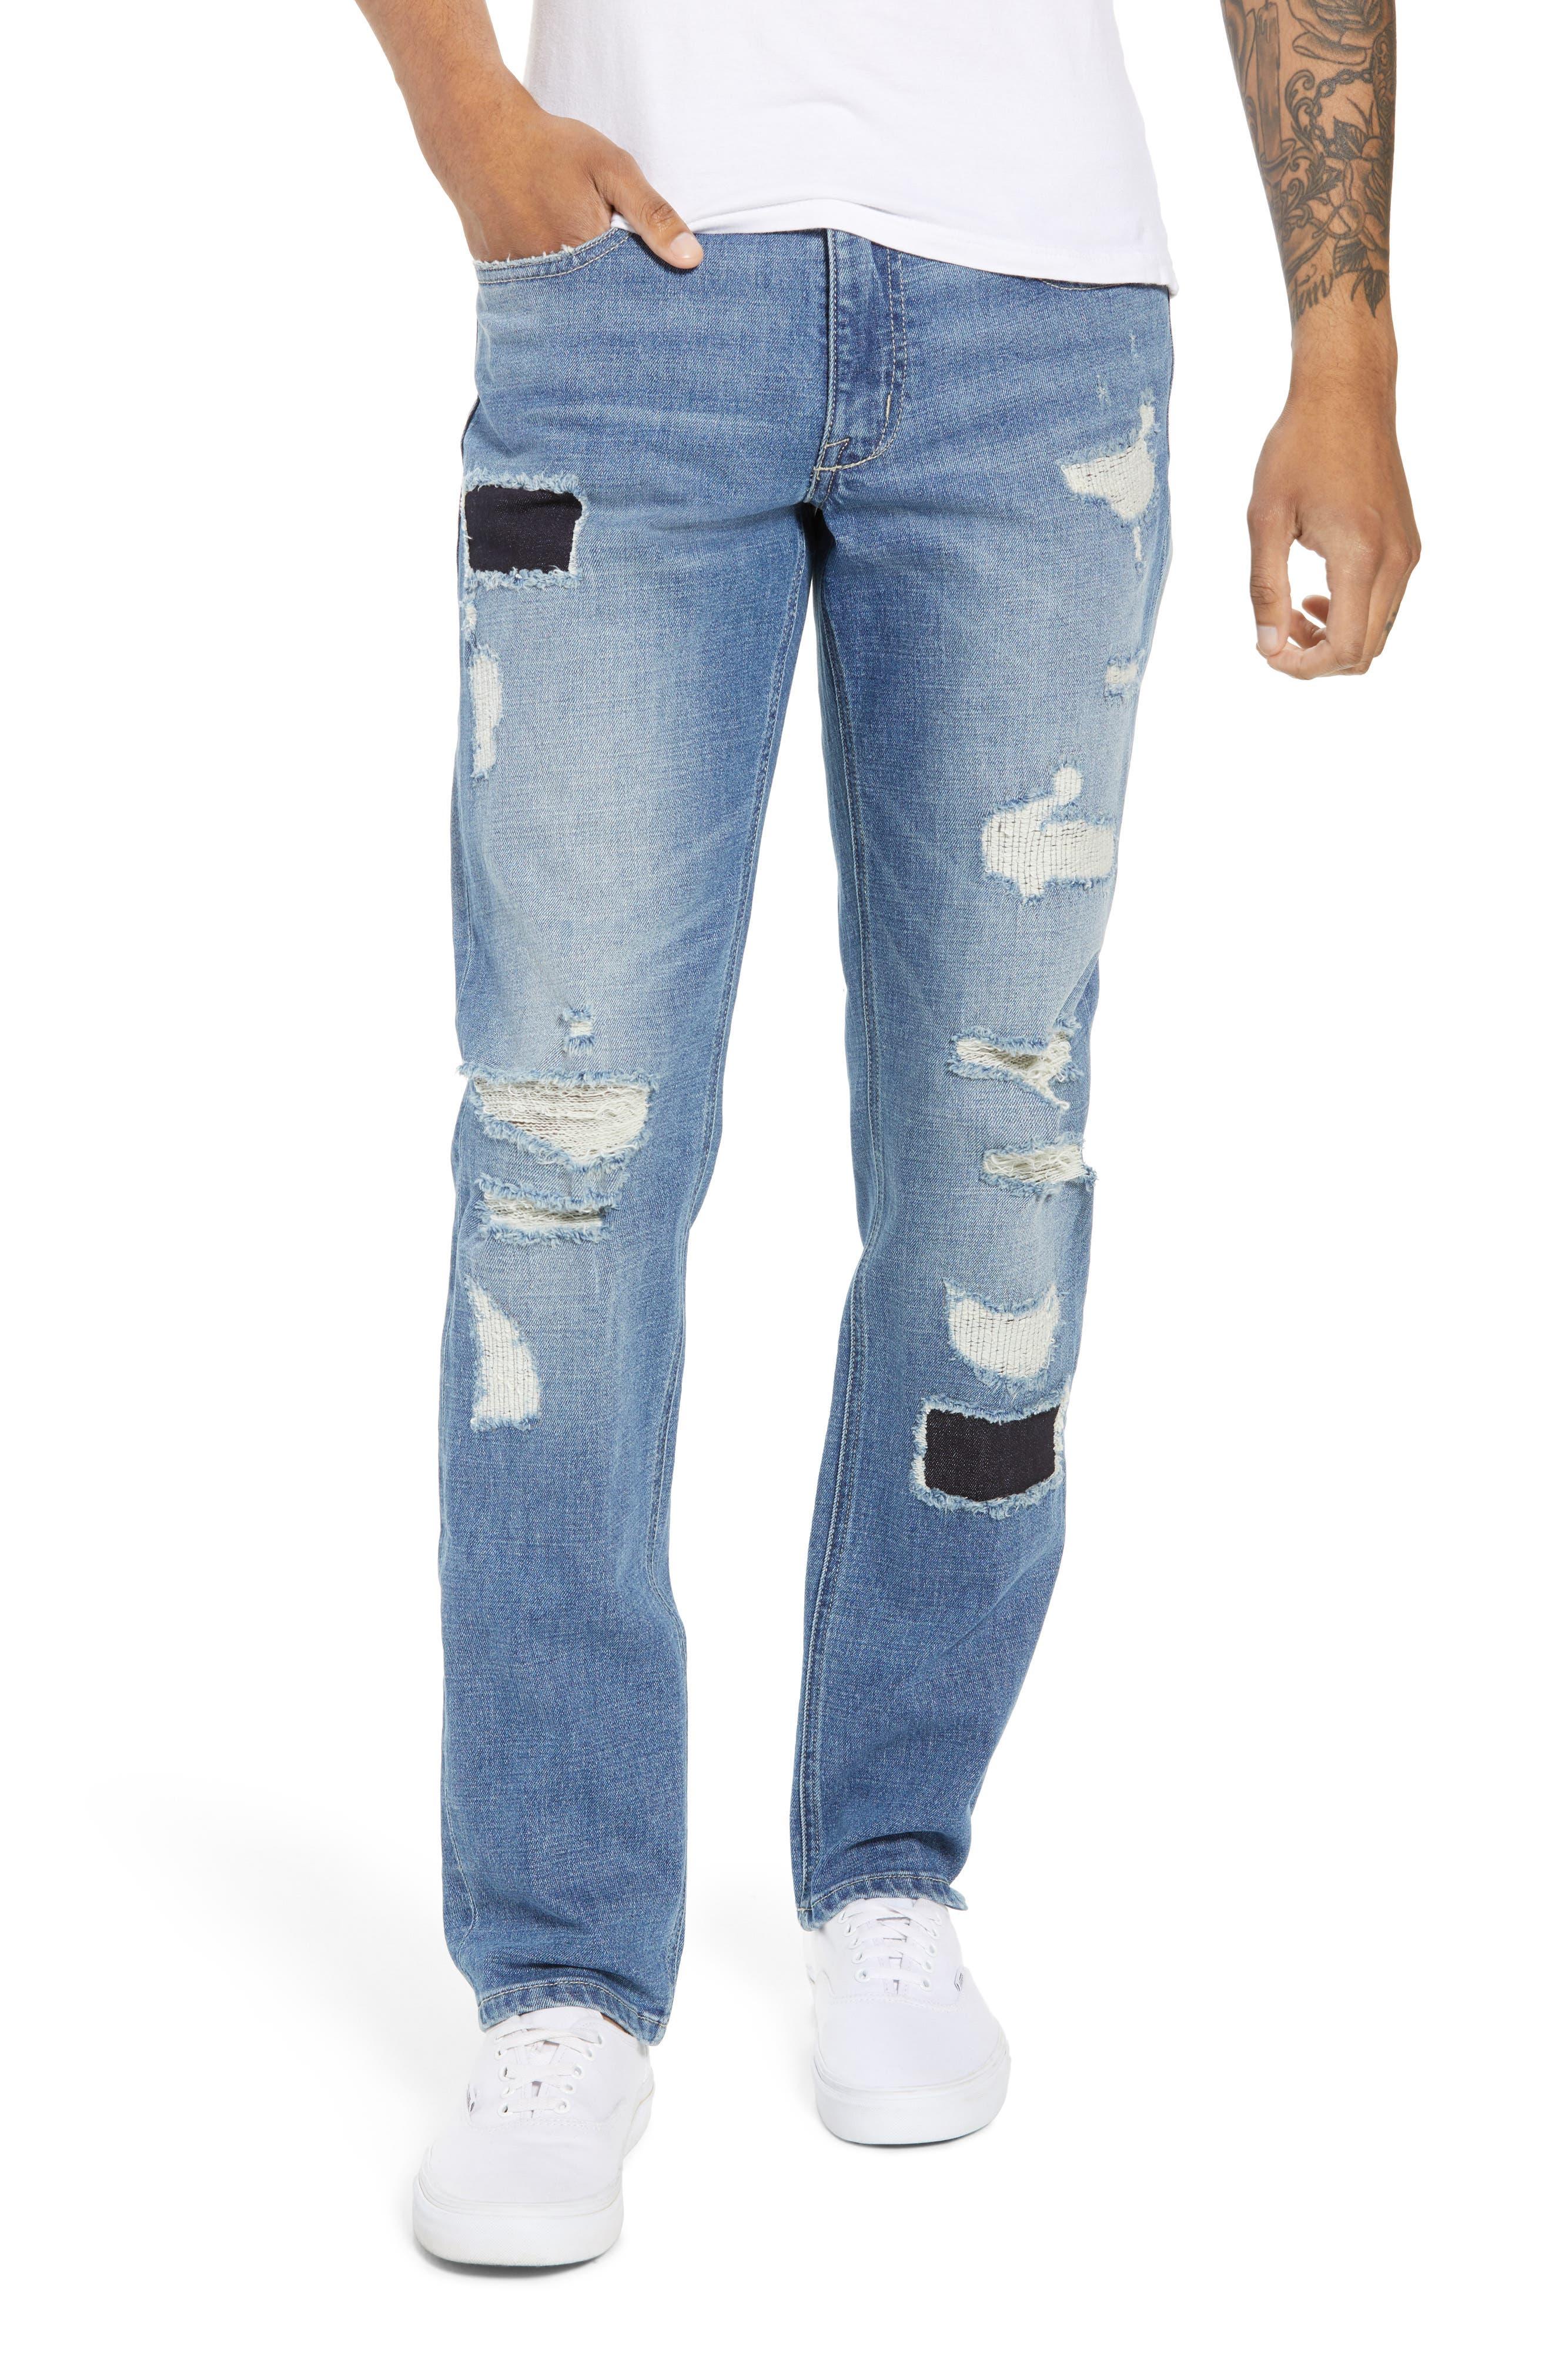 Rip & Repair Stretch Slim Jeans,                         Main,                         color, BLUE HETFIELD WASH